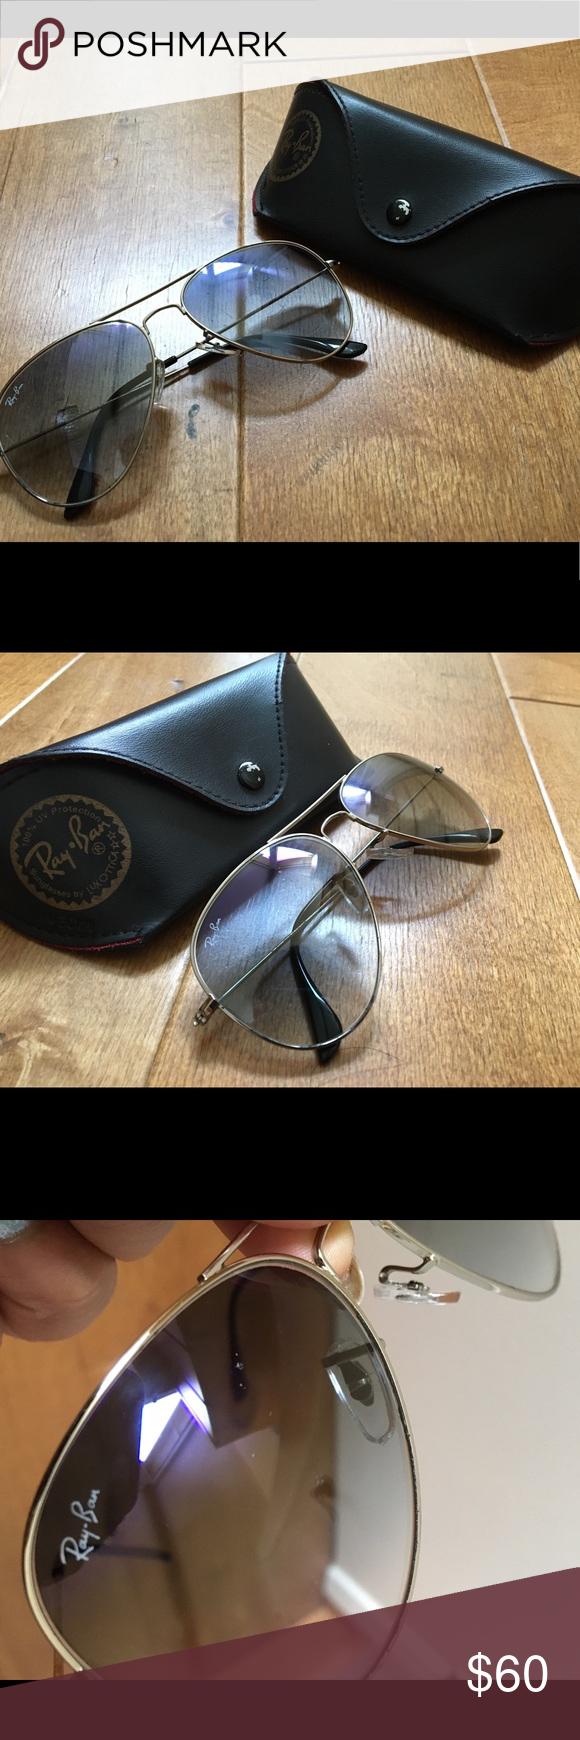 8683adbdc851e Authentic Rayban Aviators Blue-Grey Gradient Rayban RB 3026 62014 135 Ray-Ban  Aviator Gradient sunglasses encompass the teardrop …